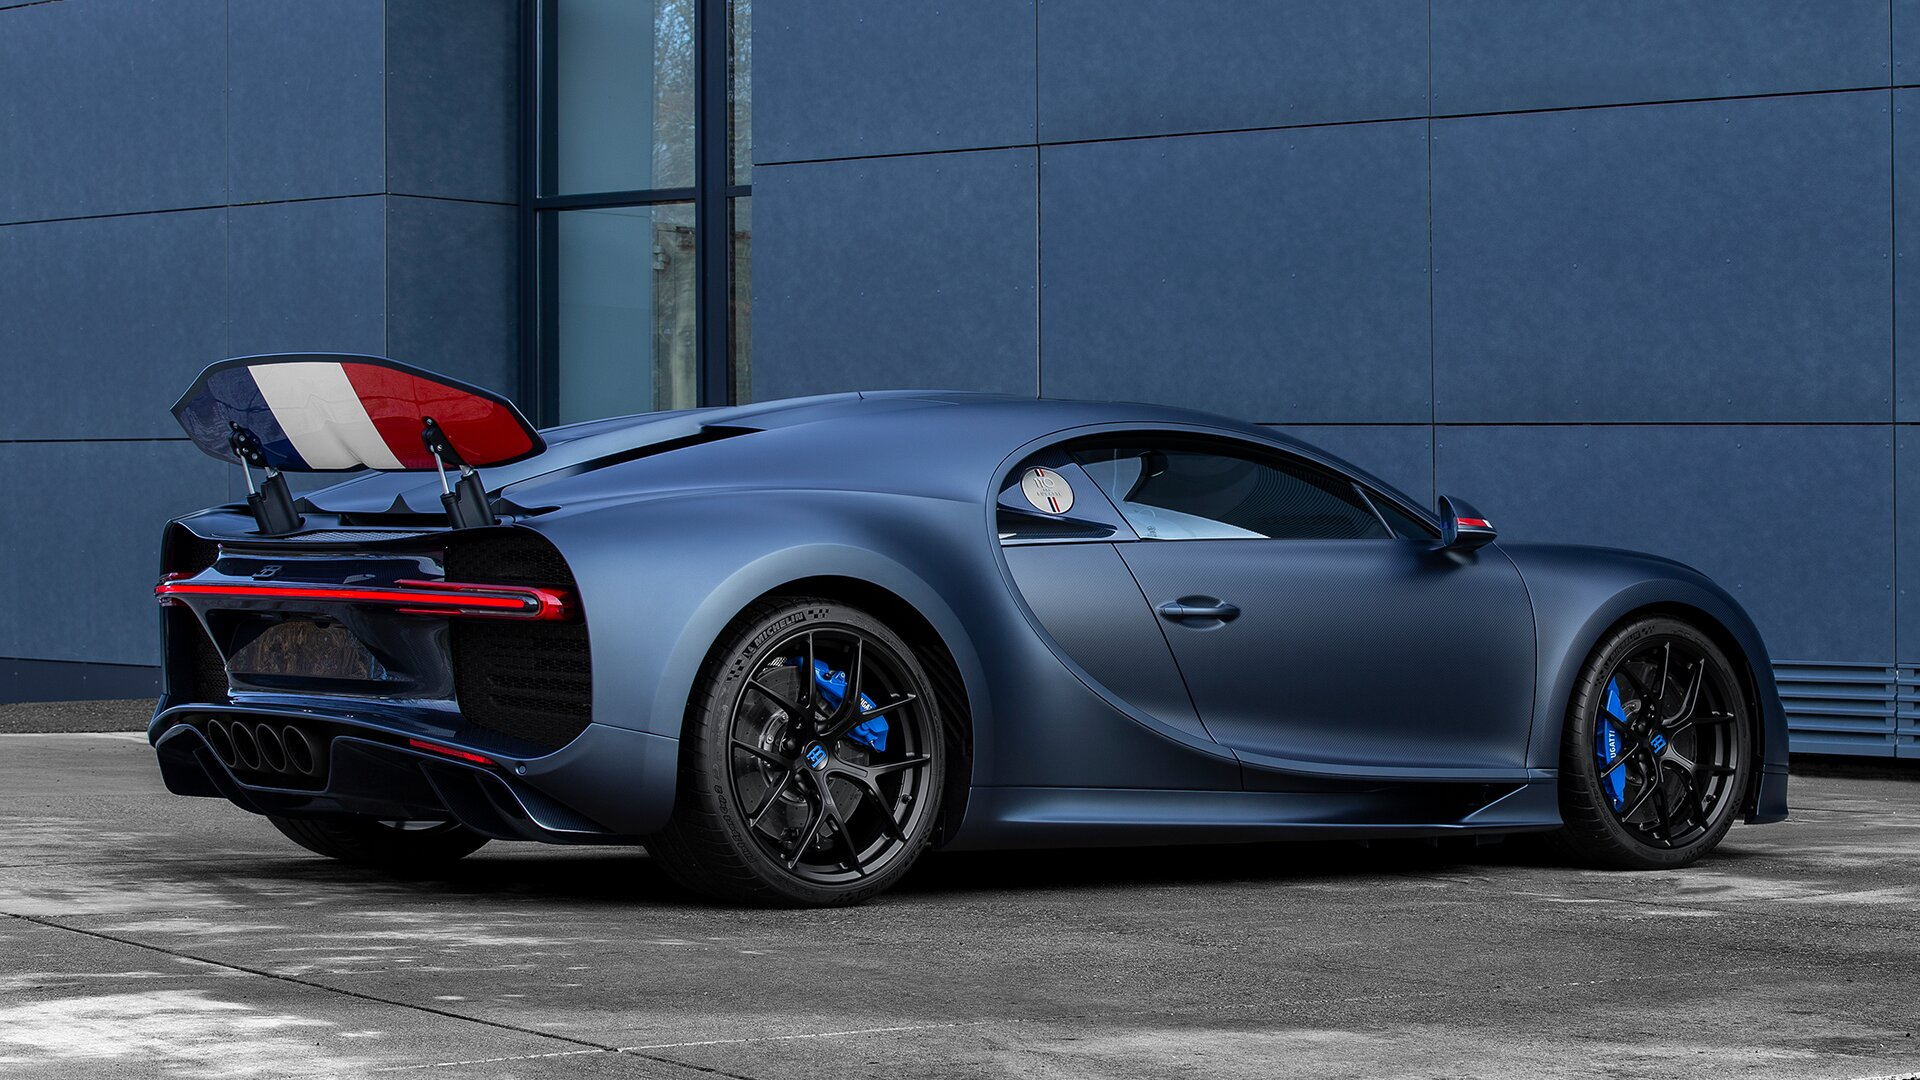 Blue Bugatti Chiron Sport 110 Ans Edition outside garage